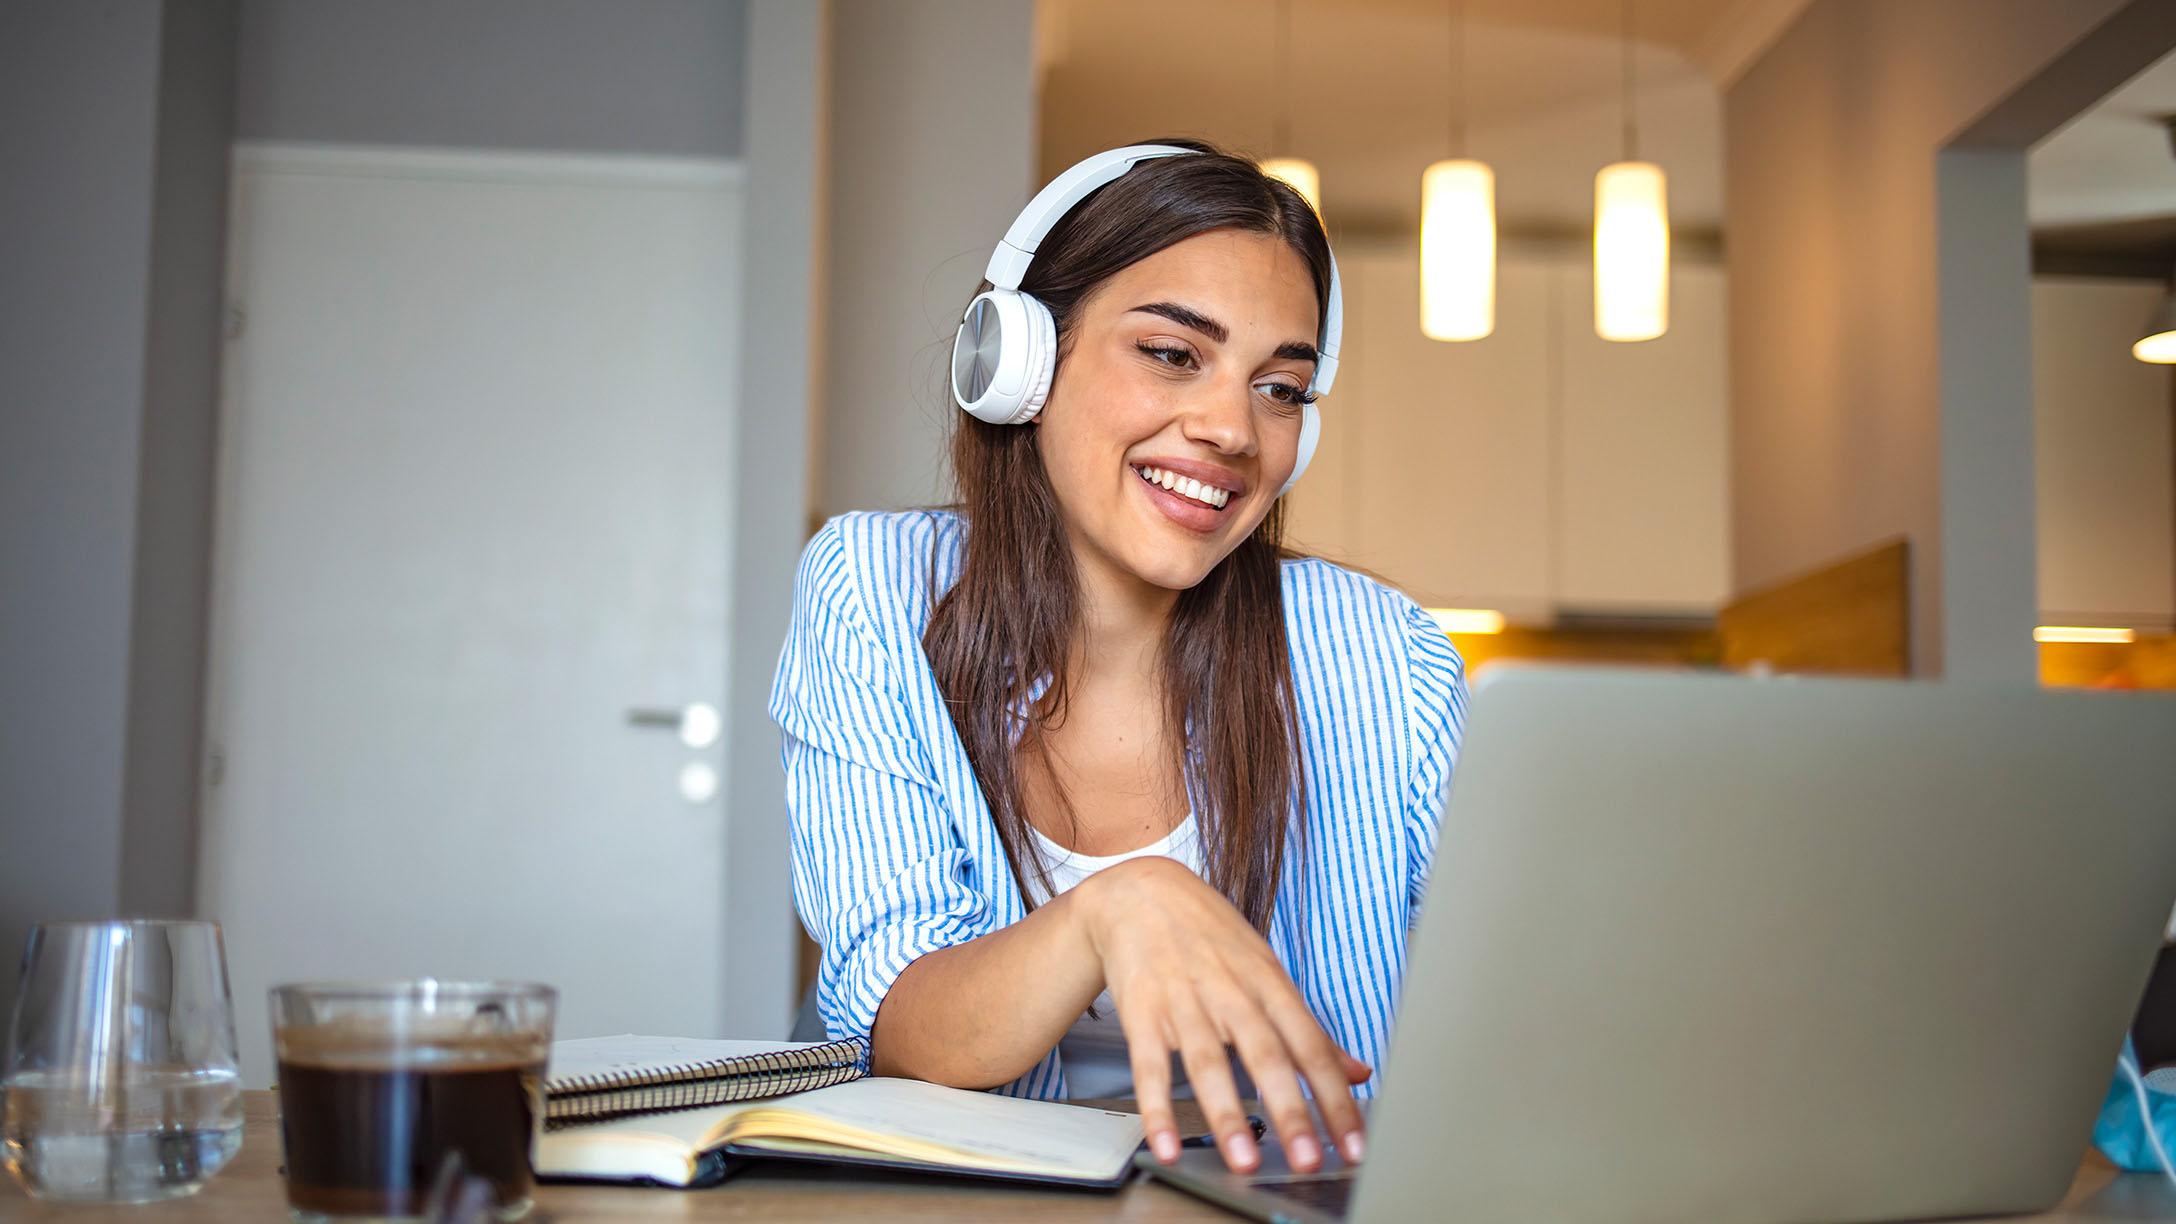 Girl smiling on computer